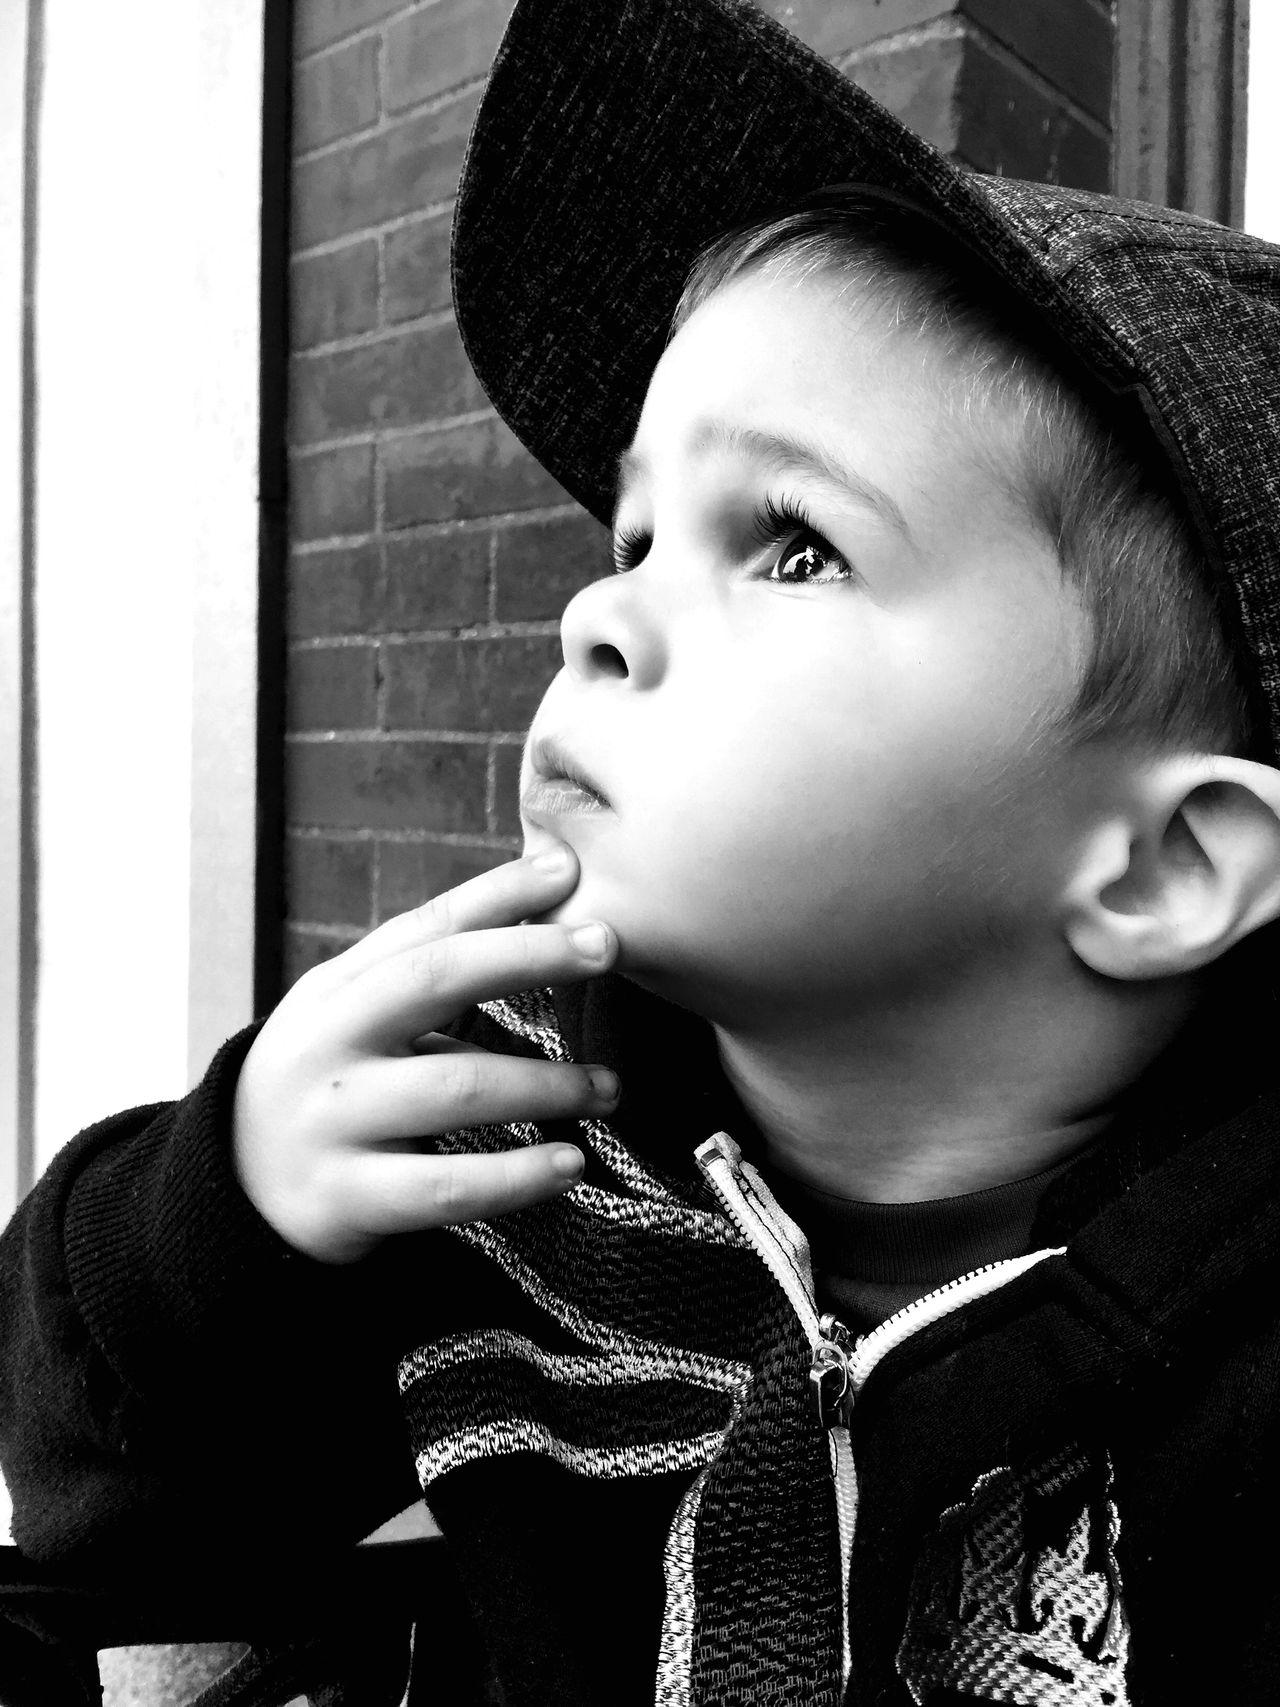 Shades Of Grey -If I Only Knew B&W Portrait Grandson Michigan United States